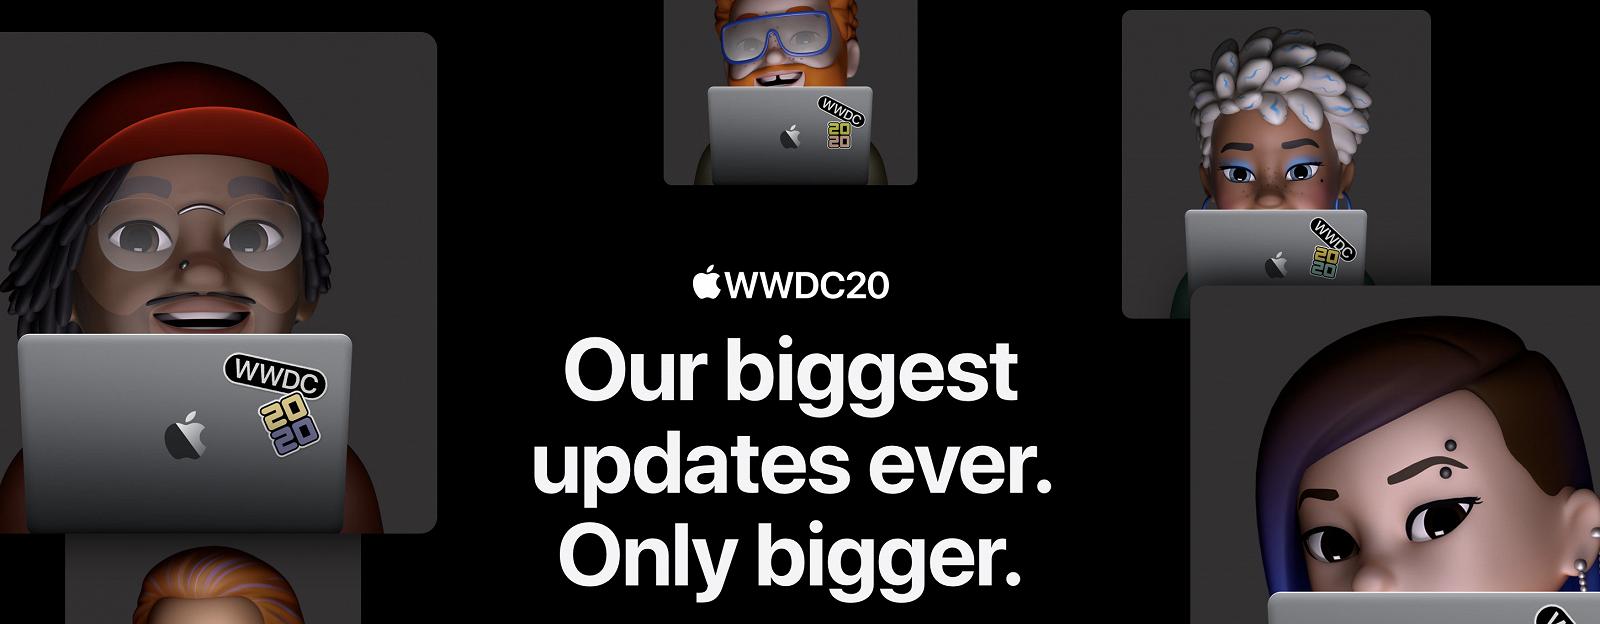 Конференция разработчиков Apple: iOS 14, отказ от Intel и другое